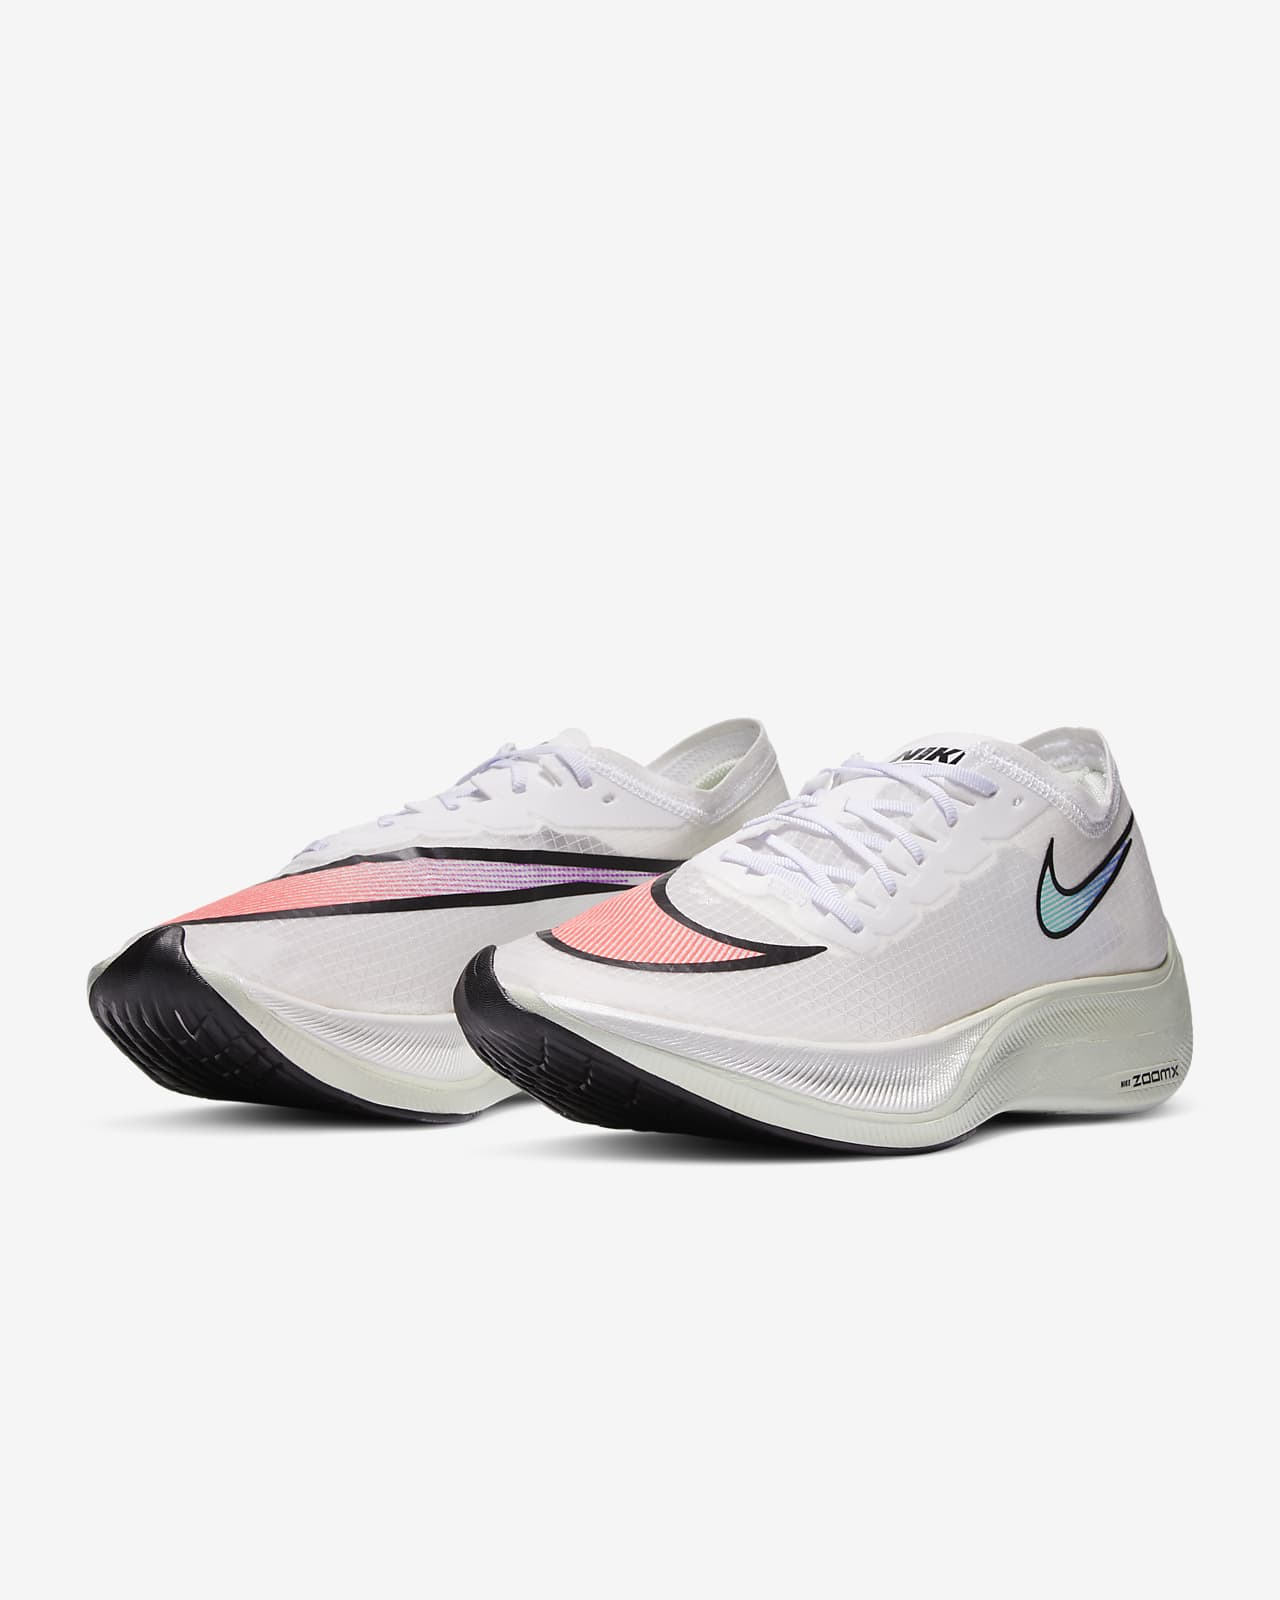 Nike Zoom Vaporfly 4 Singapore Online